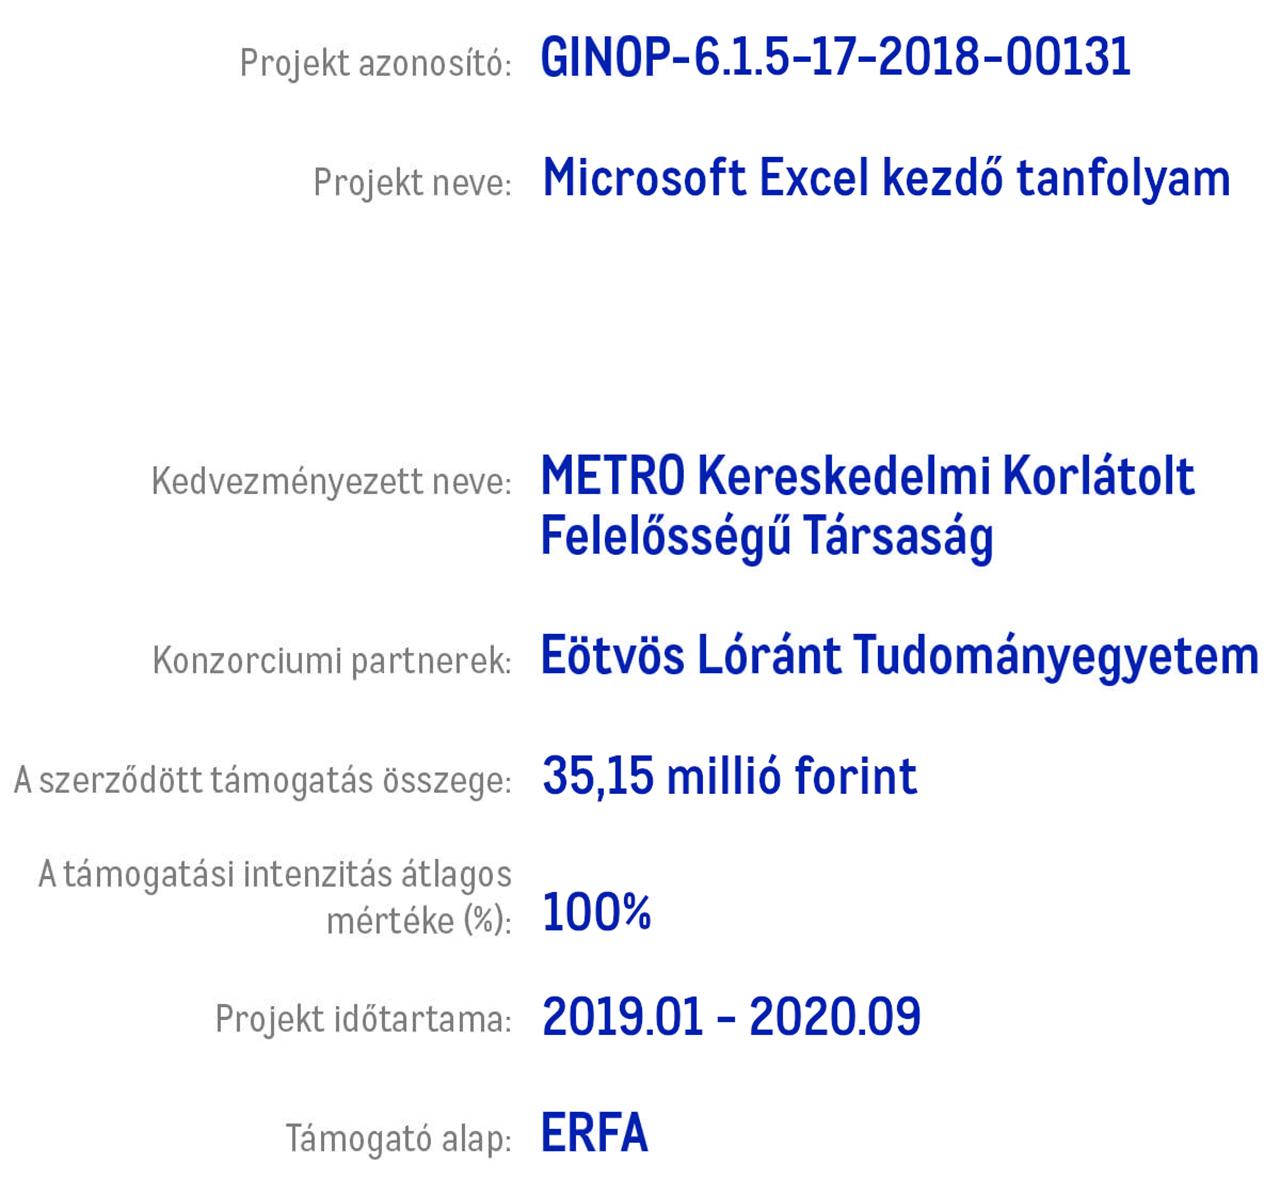 Microsoft Excel kezdő tanfolyam